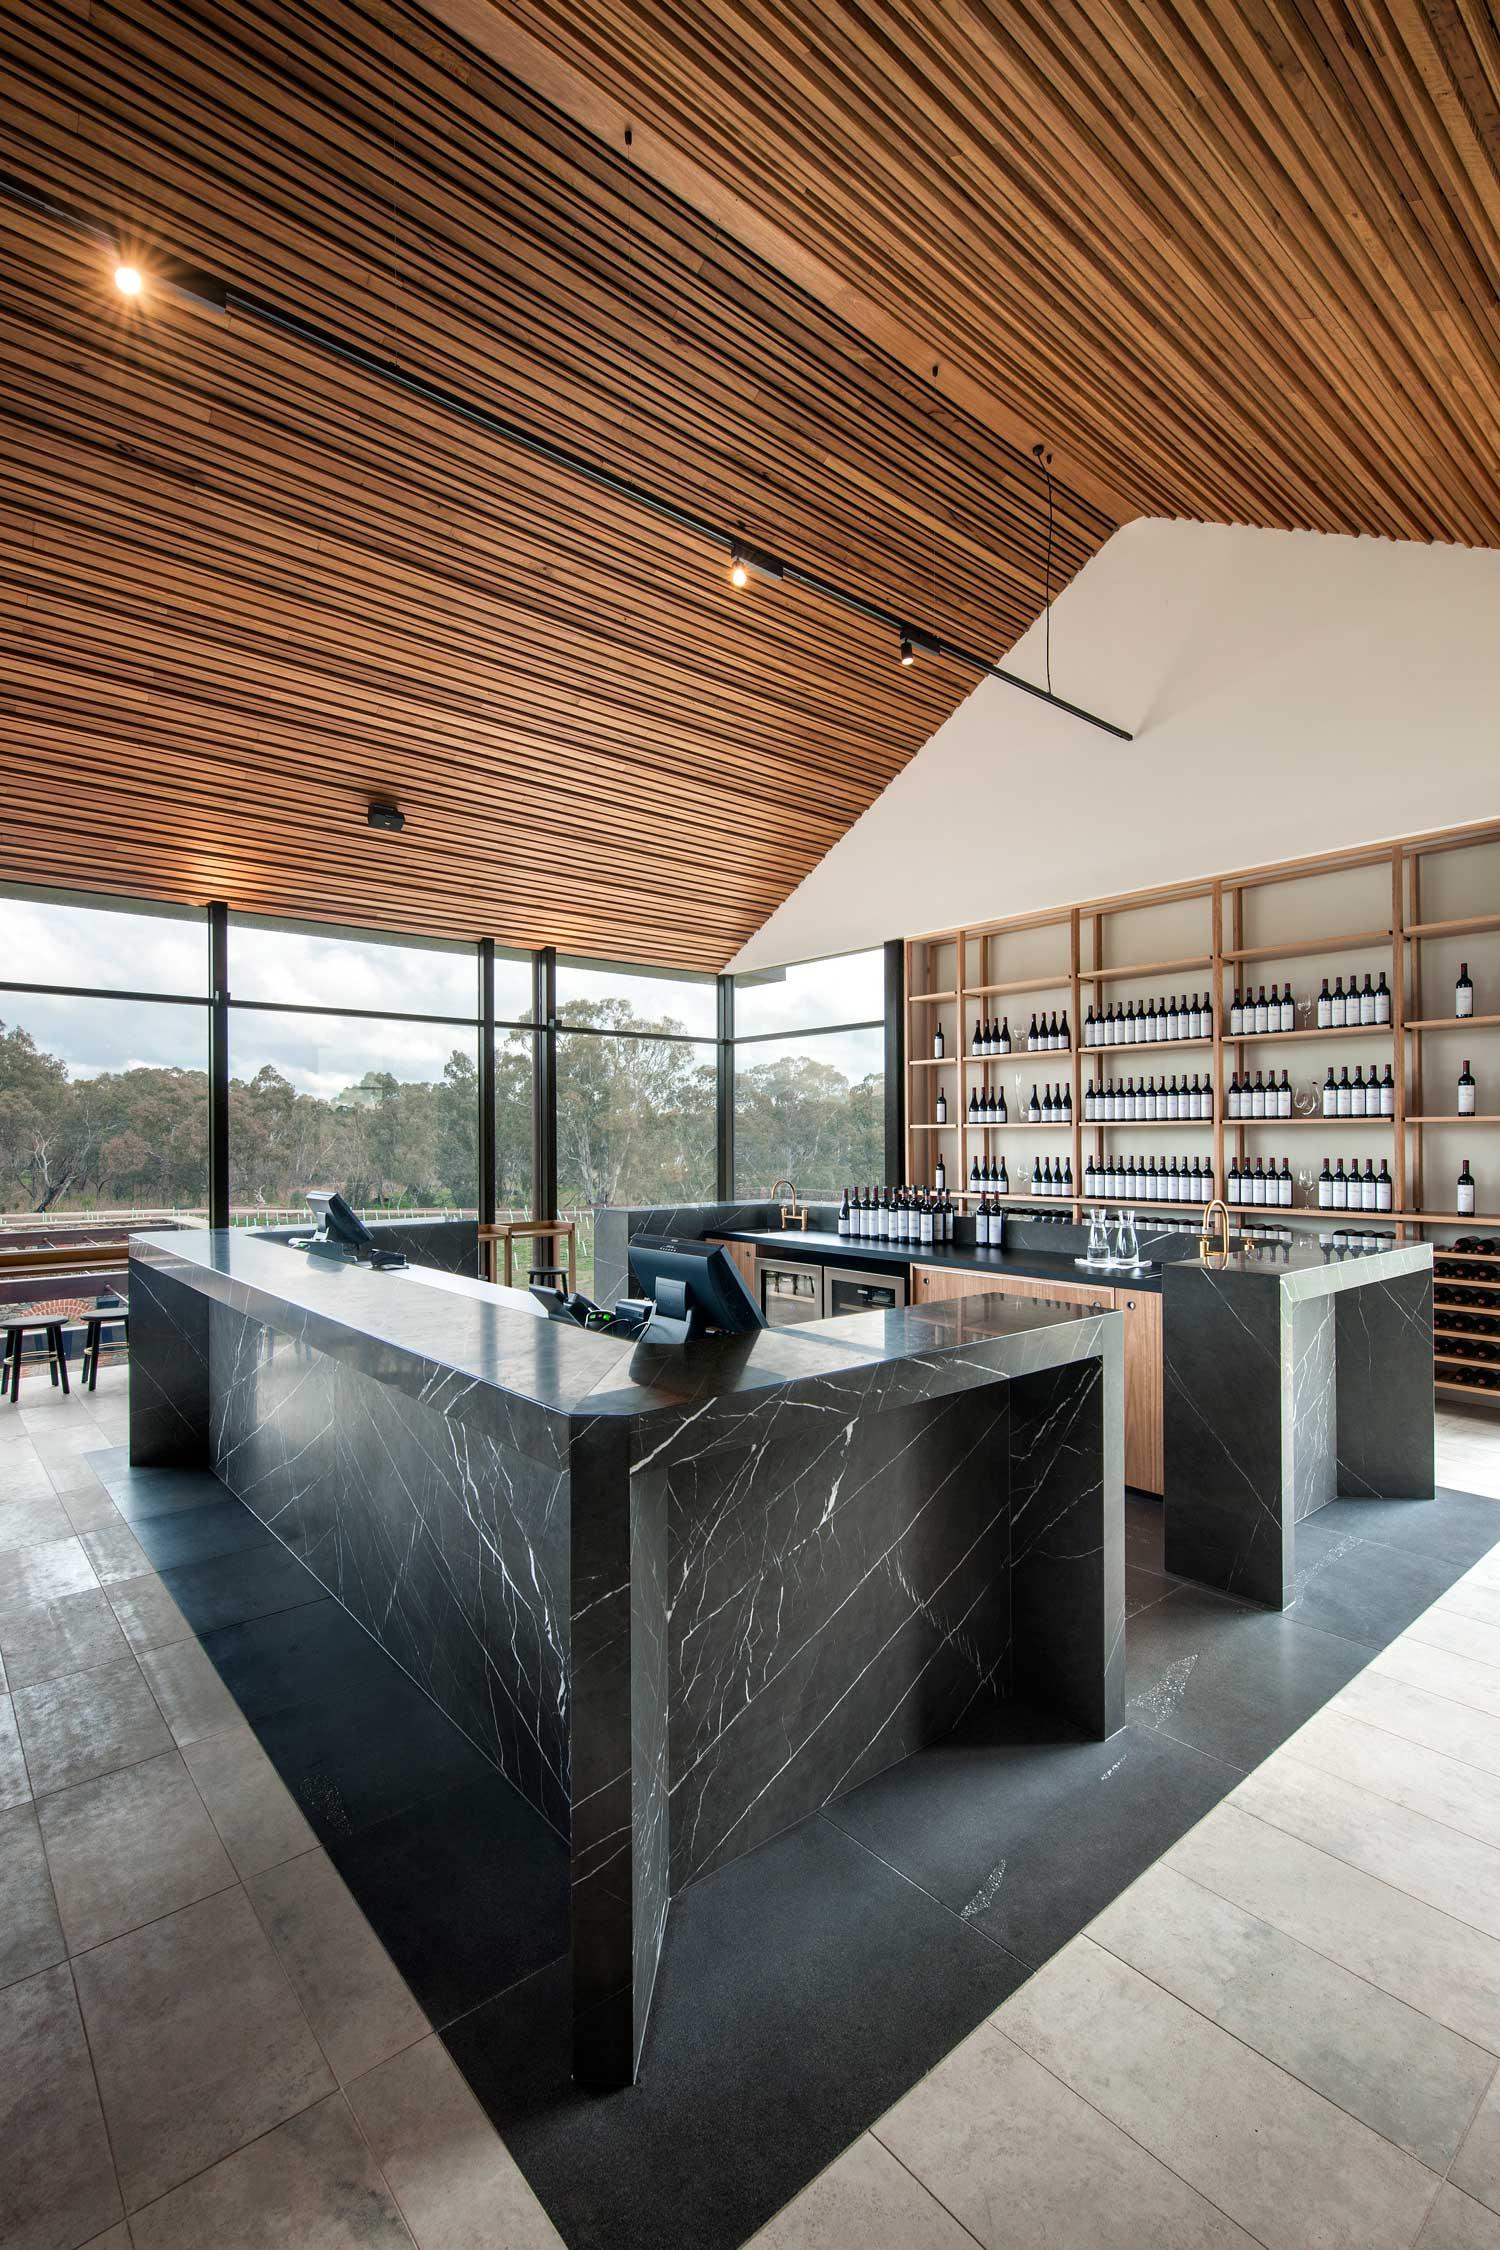 St-Hugo-Wine-Cellar-by-Studio-Gram-with-JBG-Architects-Yellowtrace-10.jpg